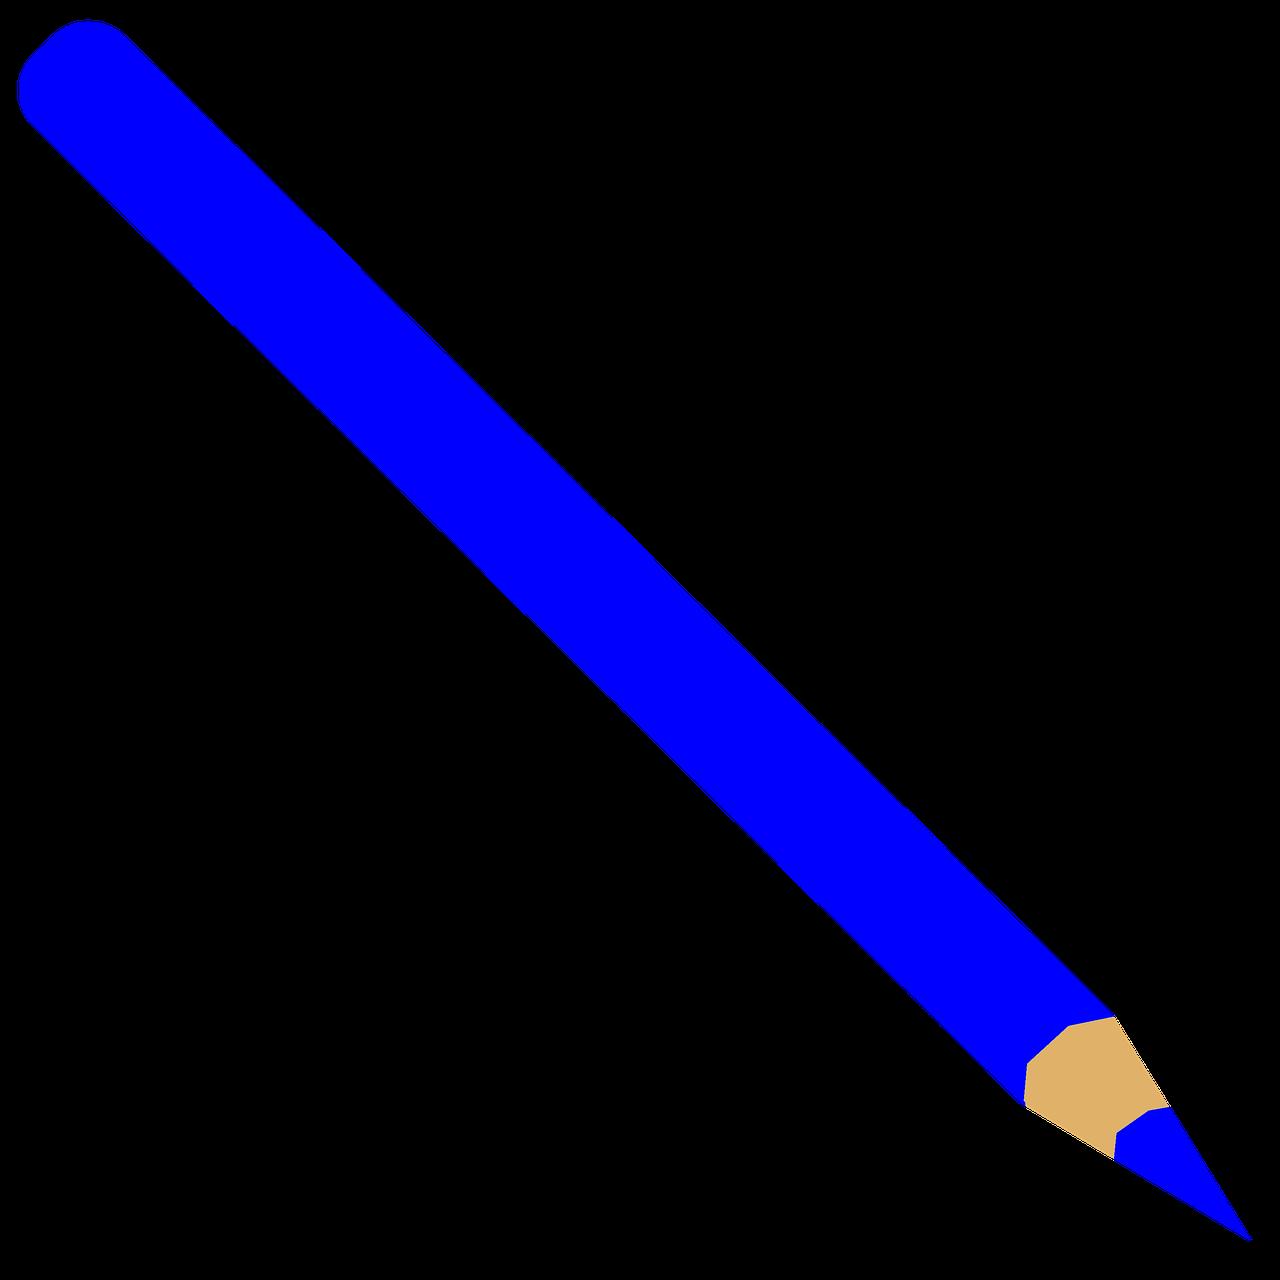 blue pencil law